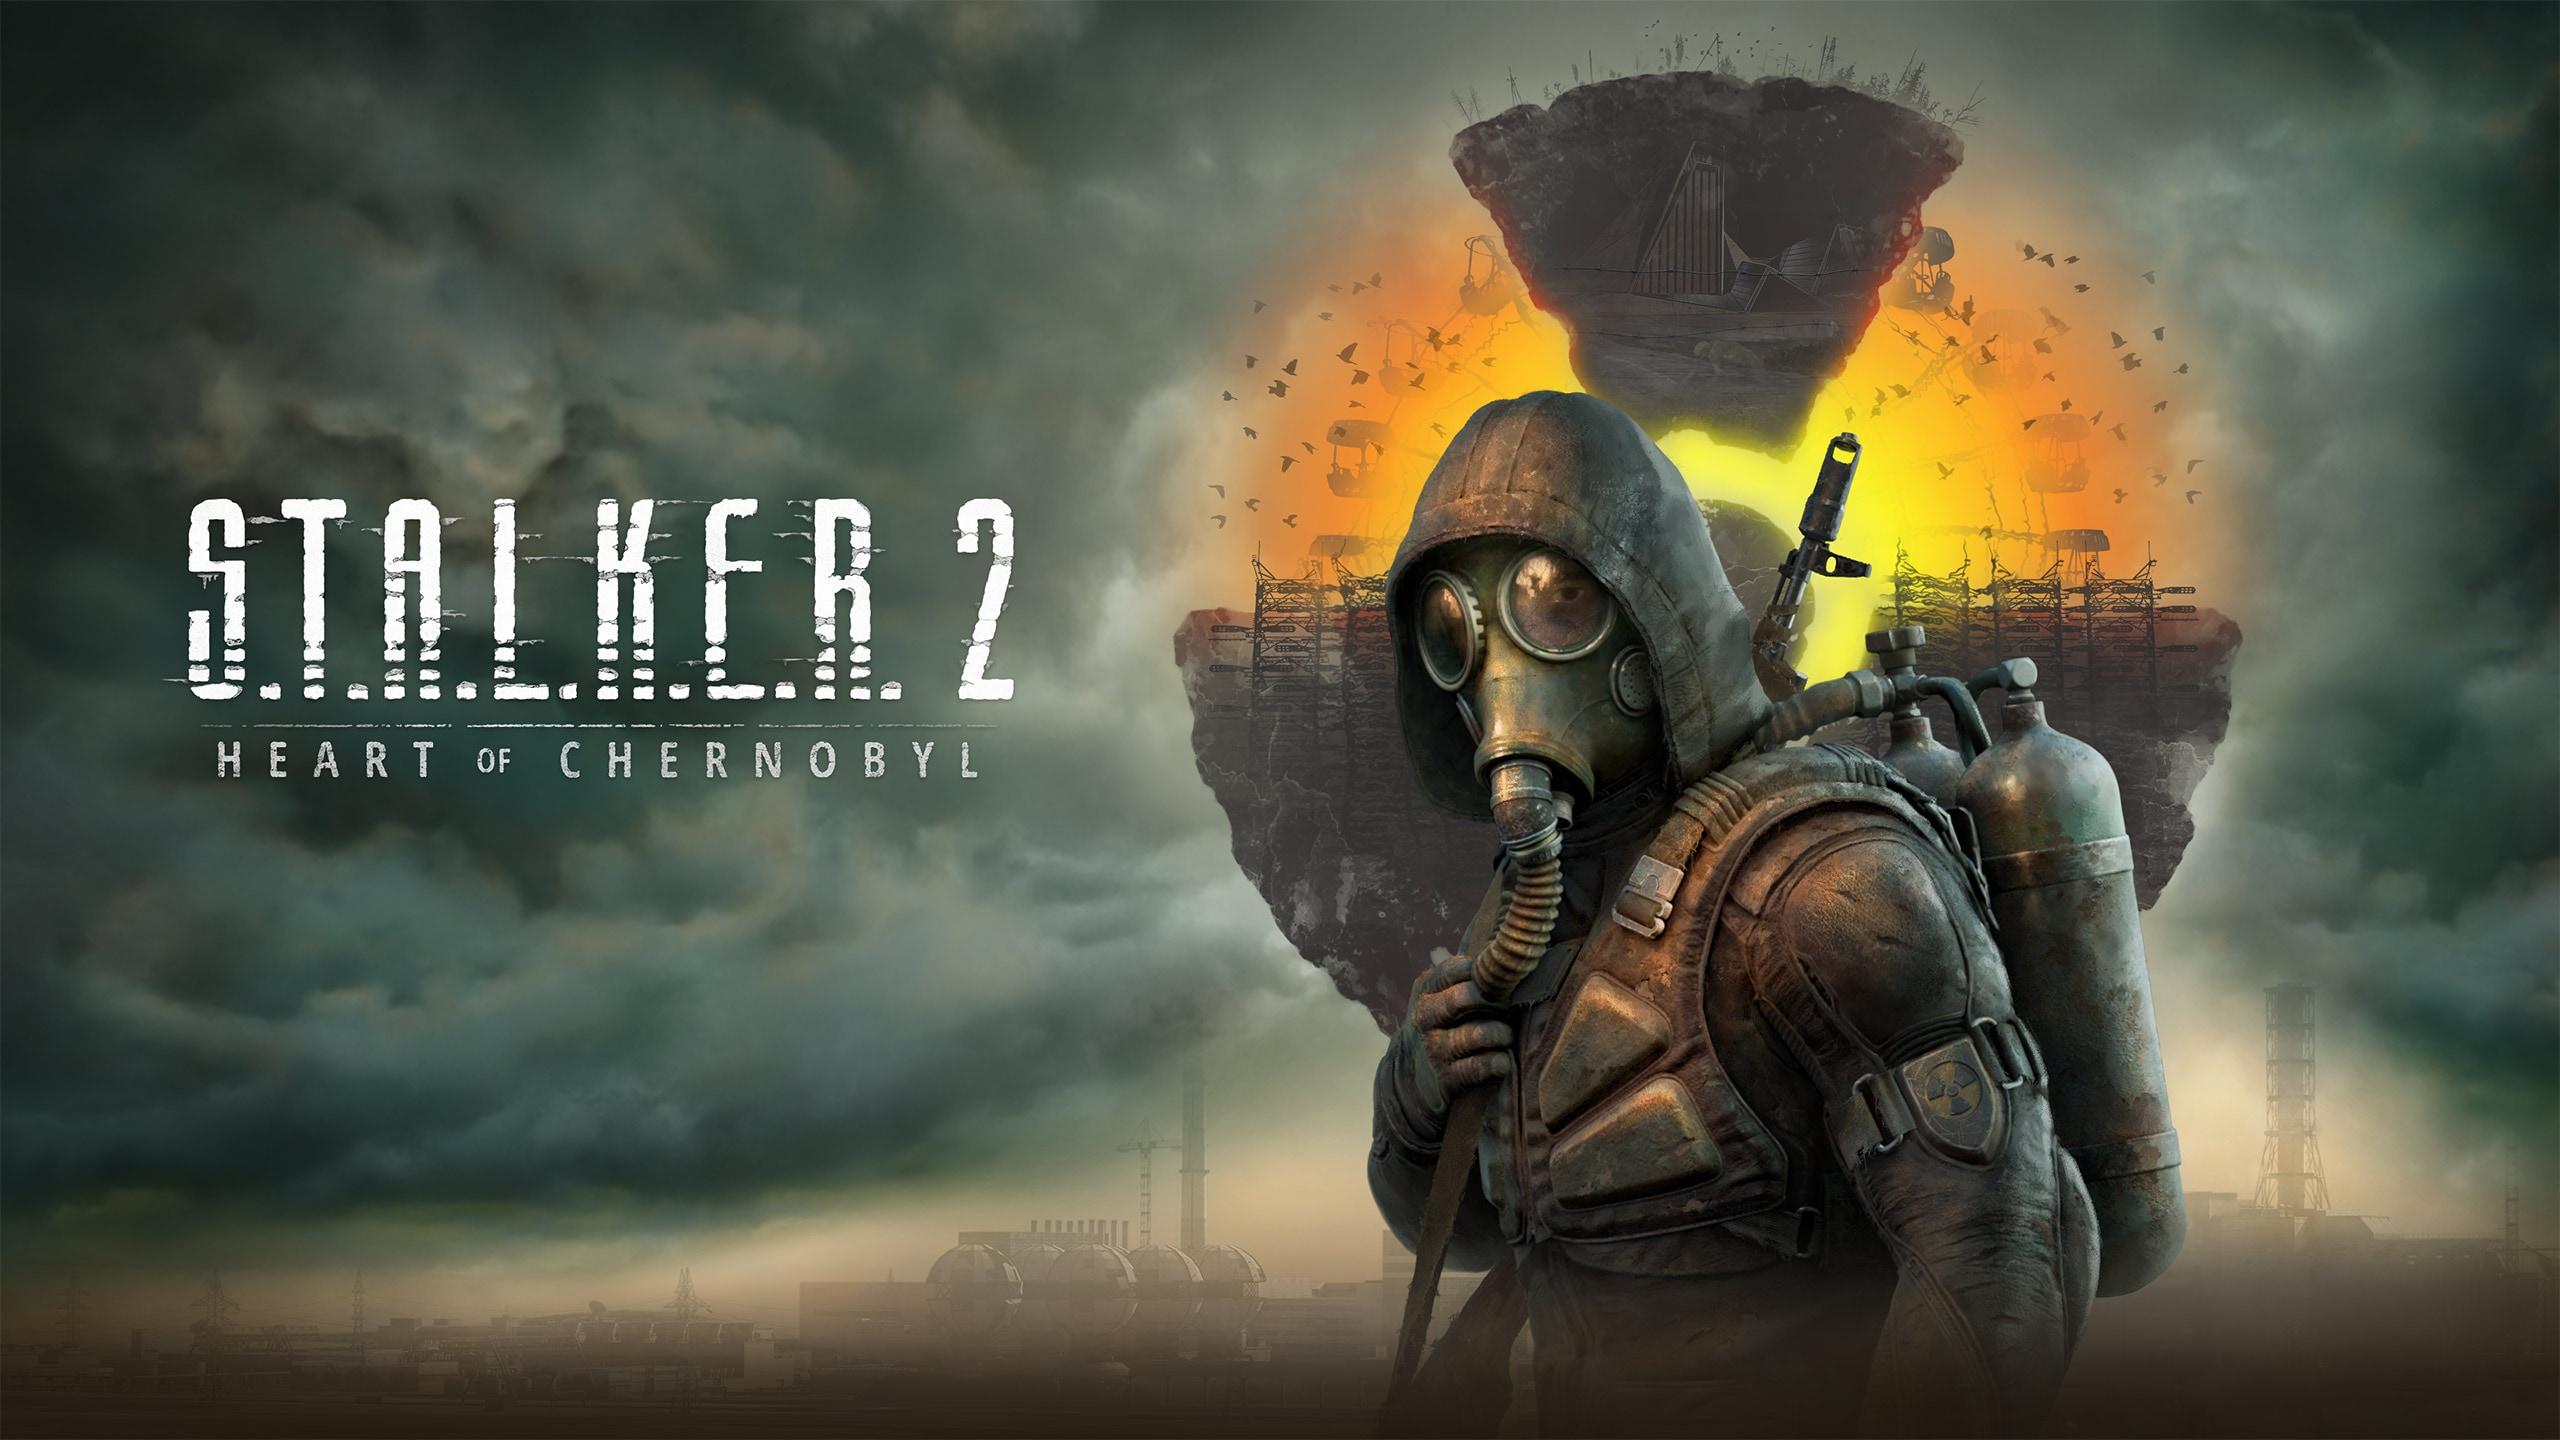 S.T.A.L.K.E.R. 2: Heart of Chernobyl (PC) - Steam Gift - EUROPE - 1